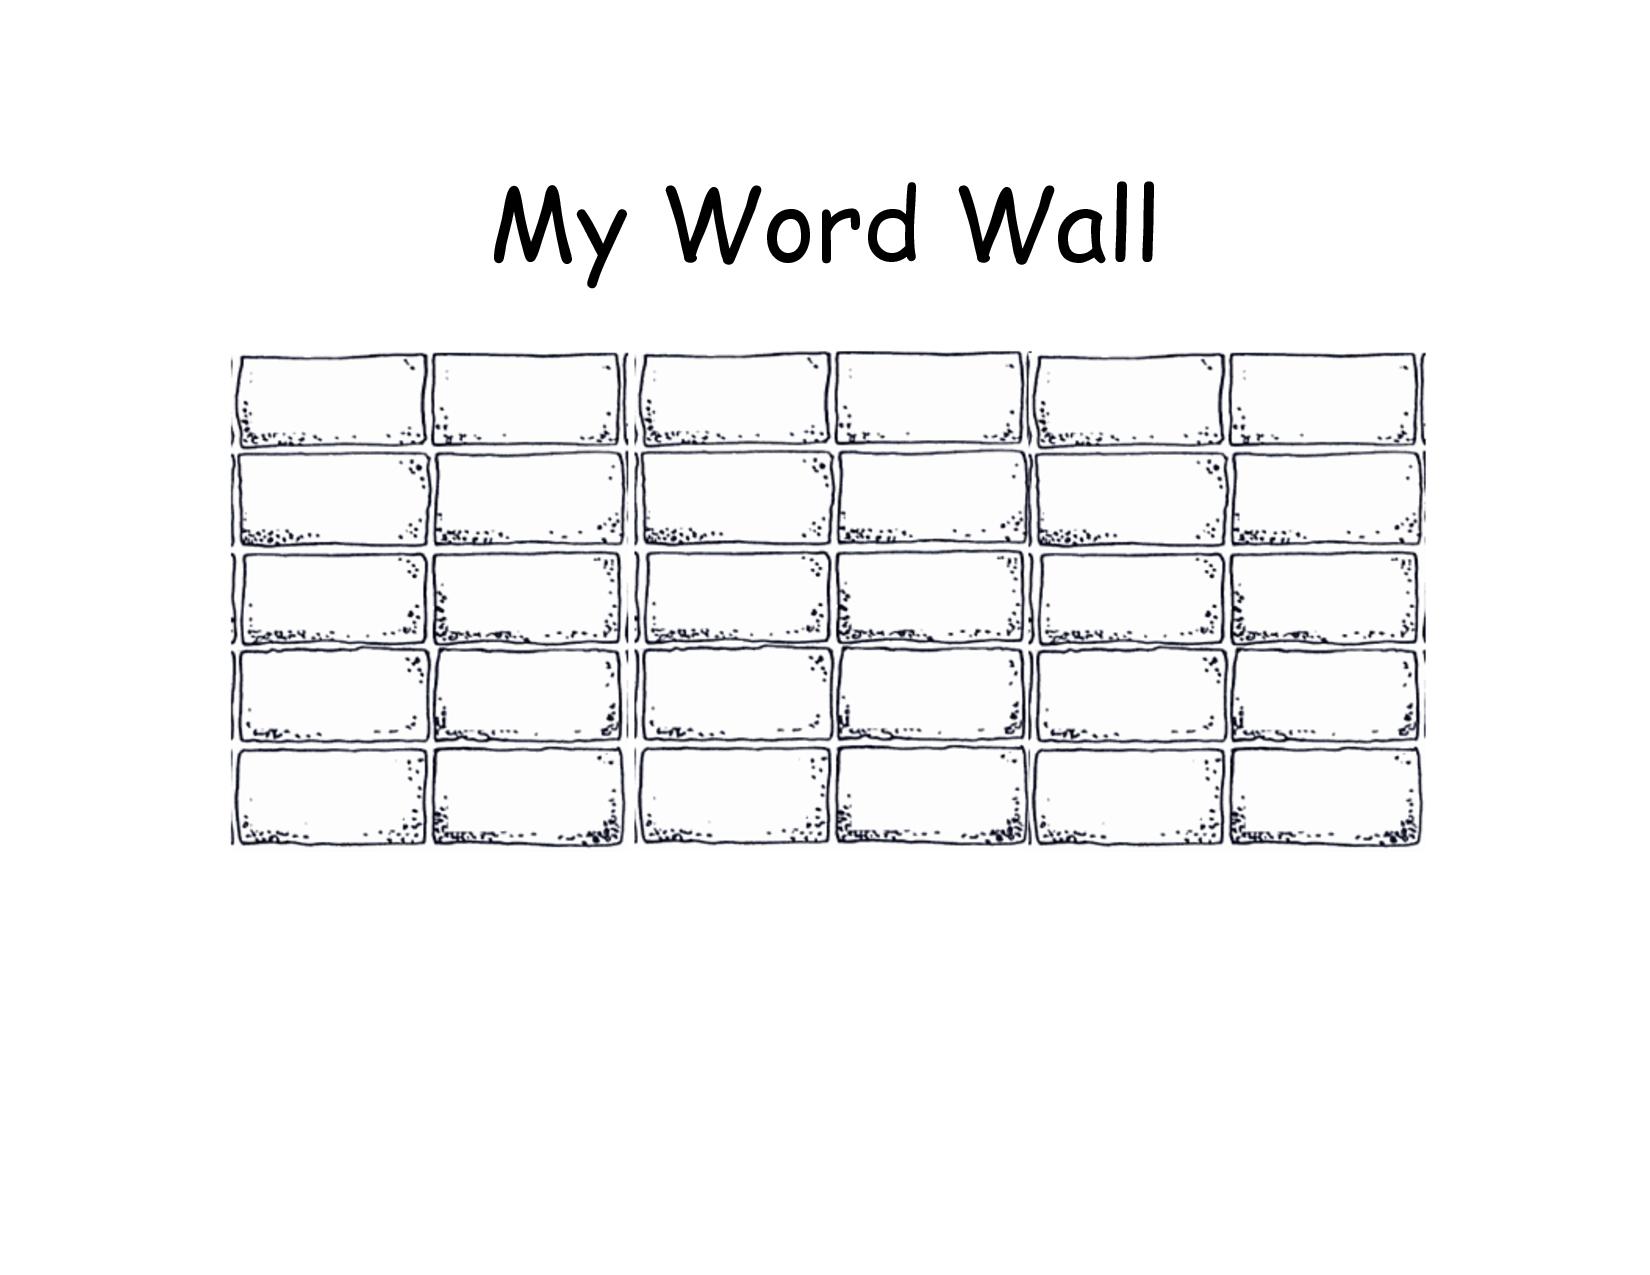 Blank+Printable+Word+Wall+Templates | Templates Printable With Regard To Blank Word Wall Template Free